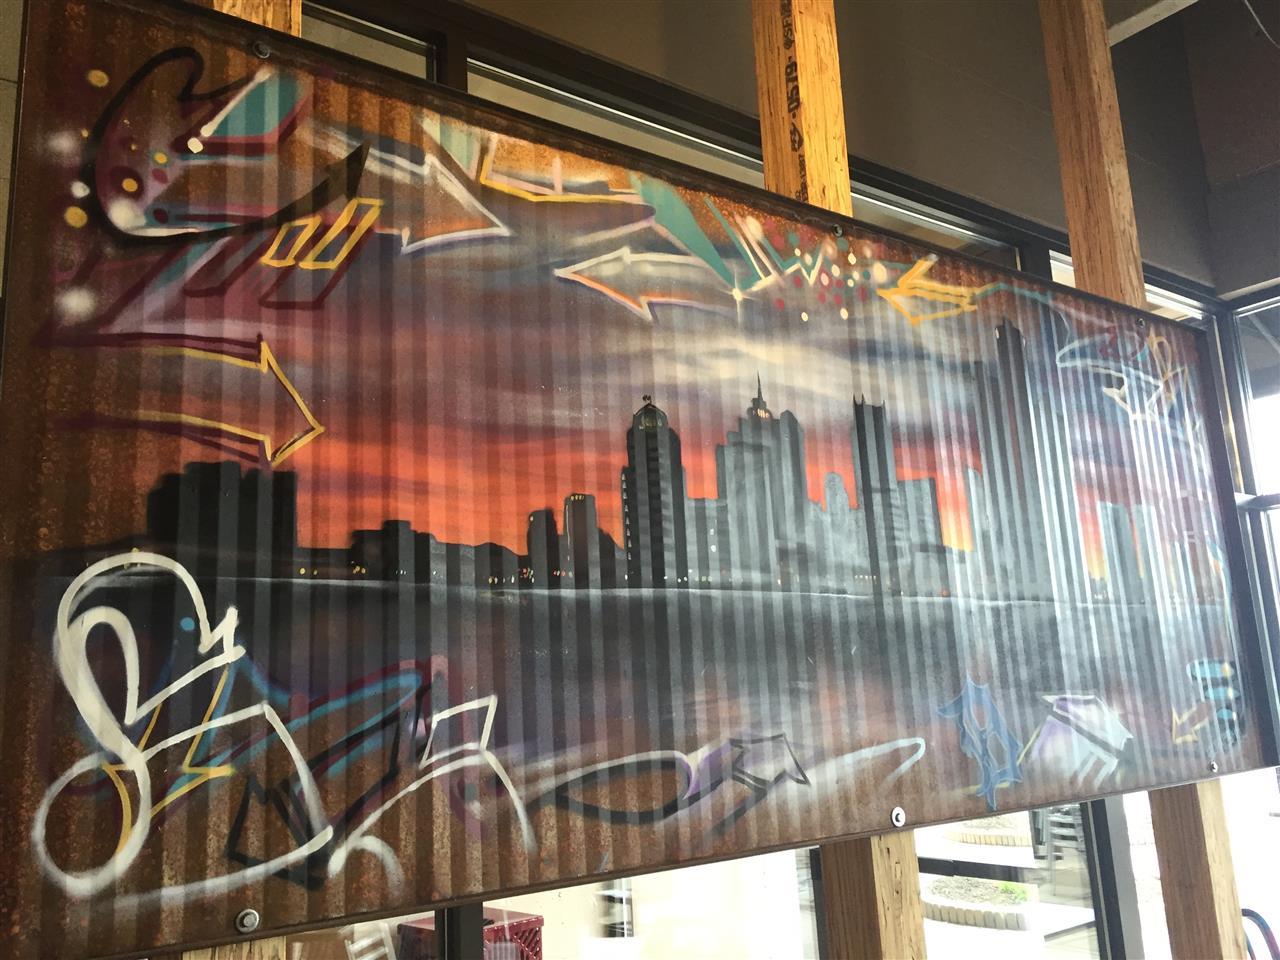 Local-inspired art in Royal OakÆs Detroit Taco Company. #RoyalOak #Michigan